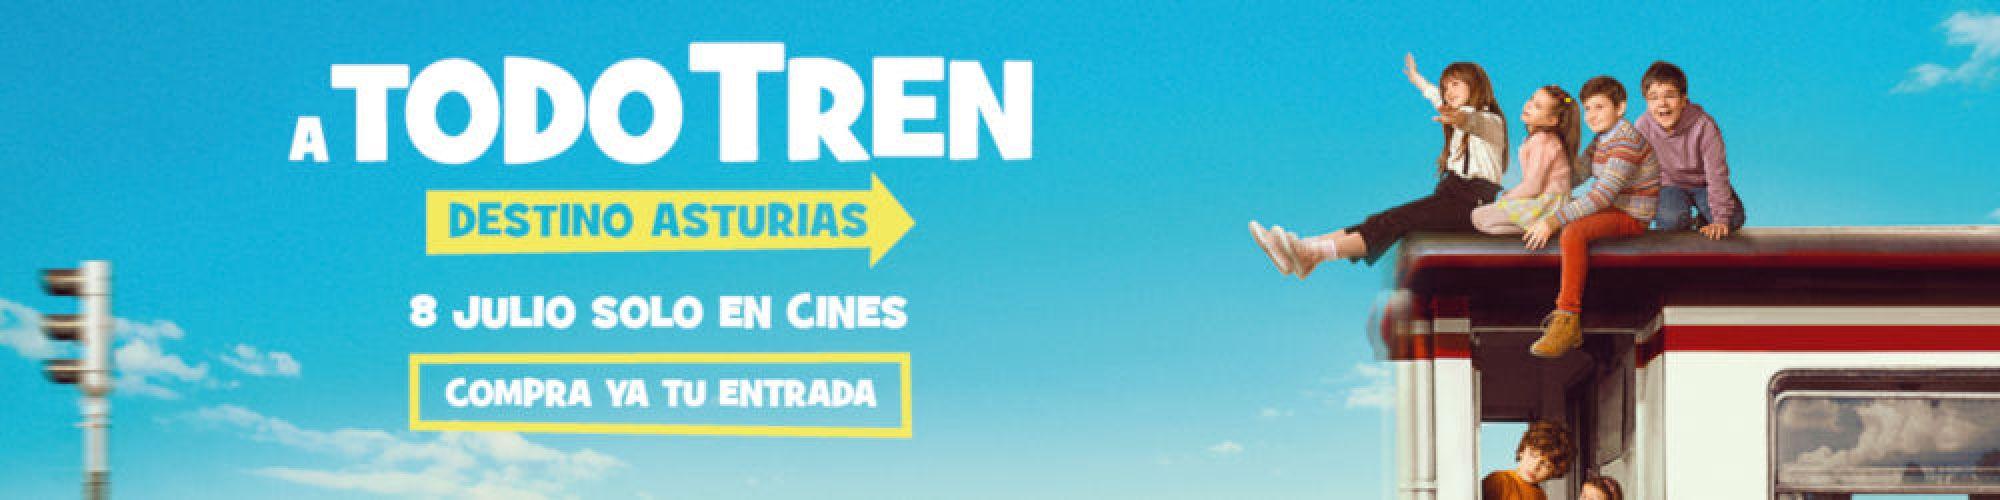 A TODO TREN Destino Asturias (Banner Superior)